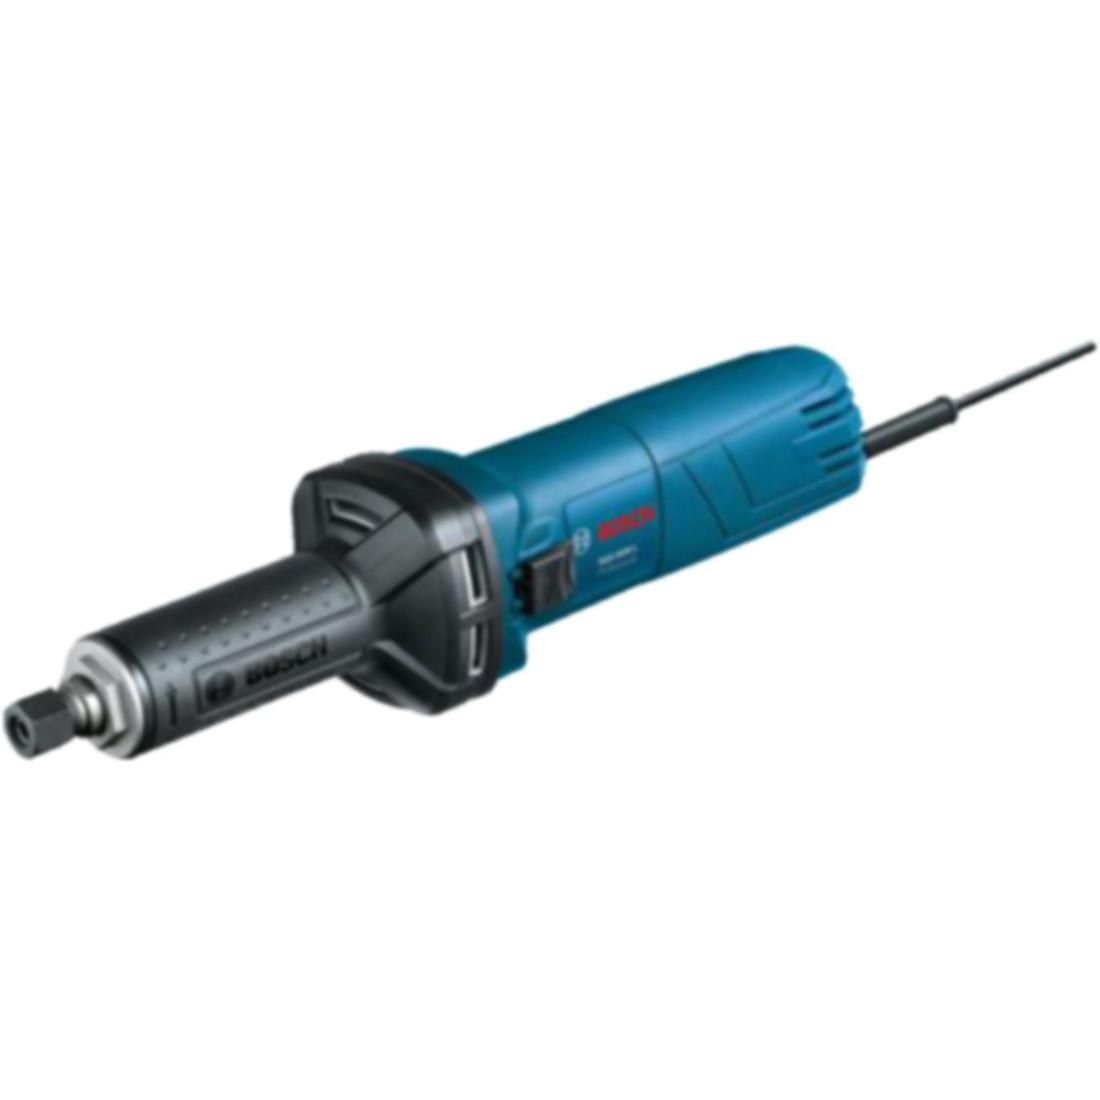 GGS 5000 L Professional